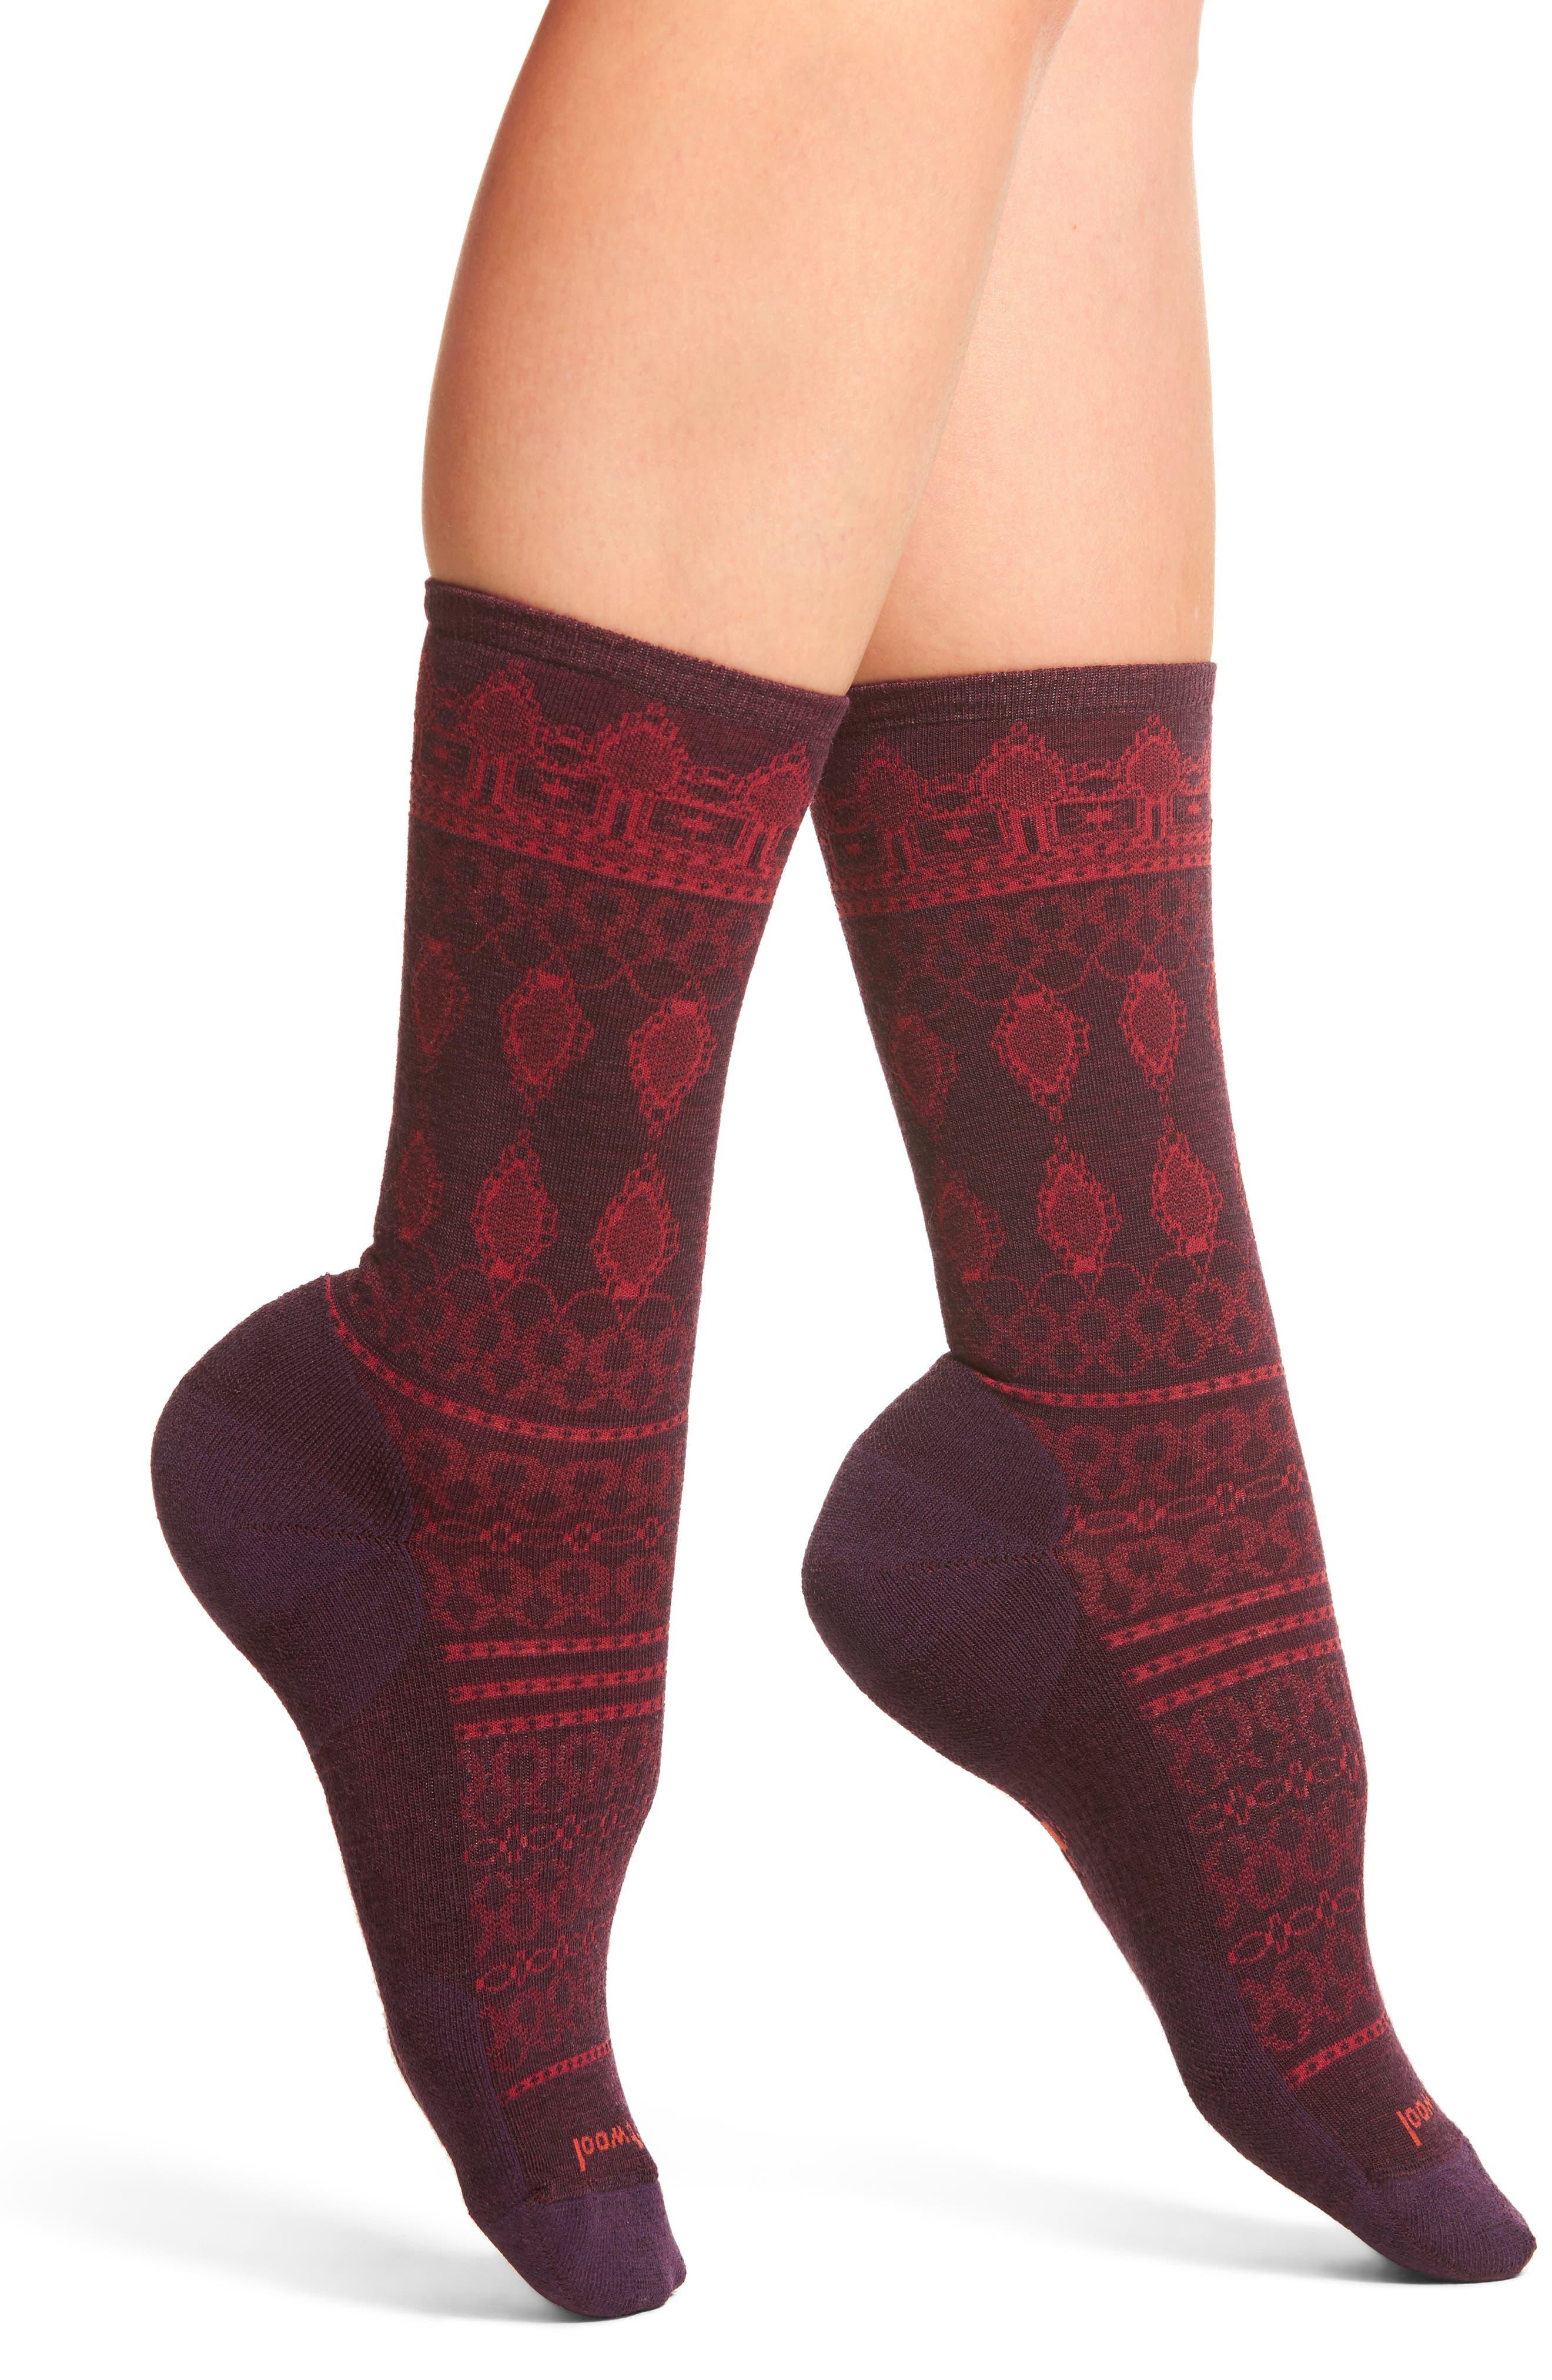 Smartwool Lacet Crew Socks